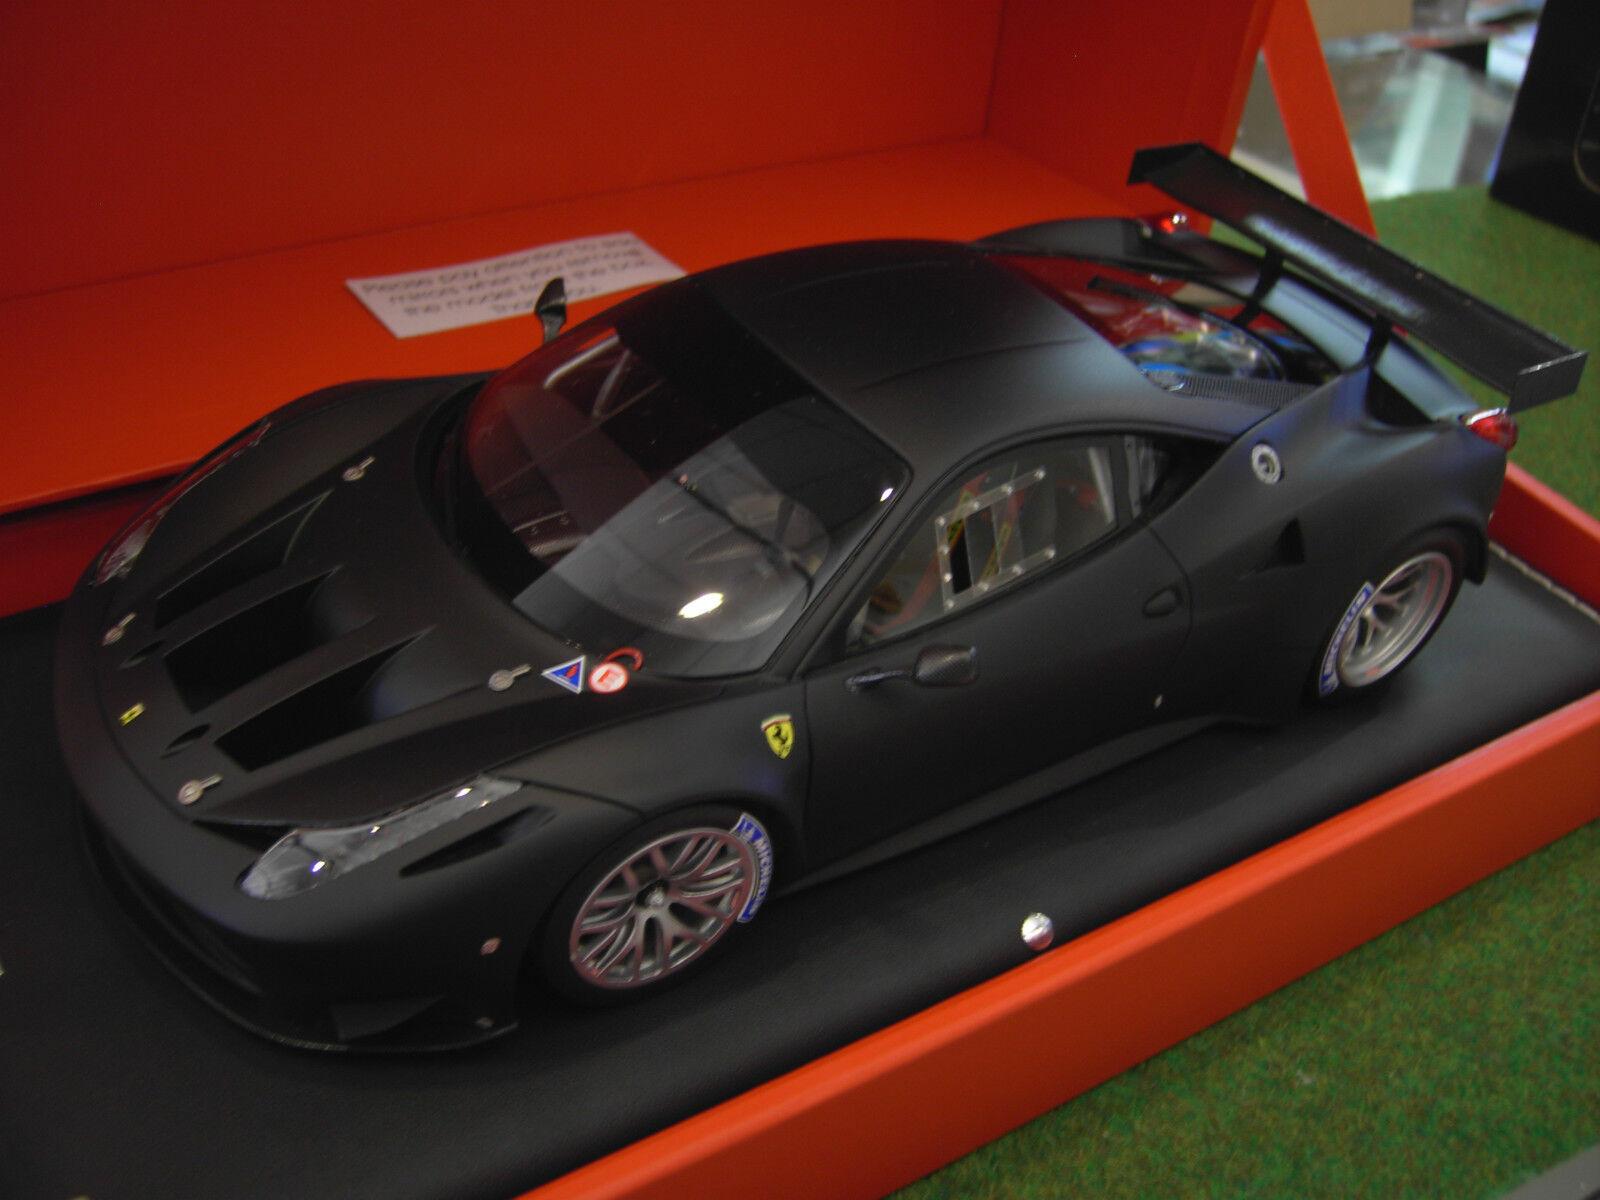 FERRARI 458 GT2 black mat echelle 1 1 1 18 d MR FE05C voiture miniature de collection 3a8f36